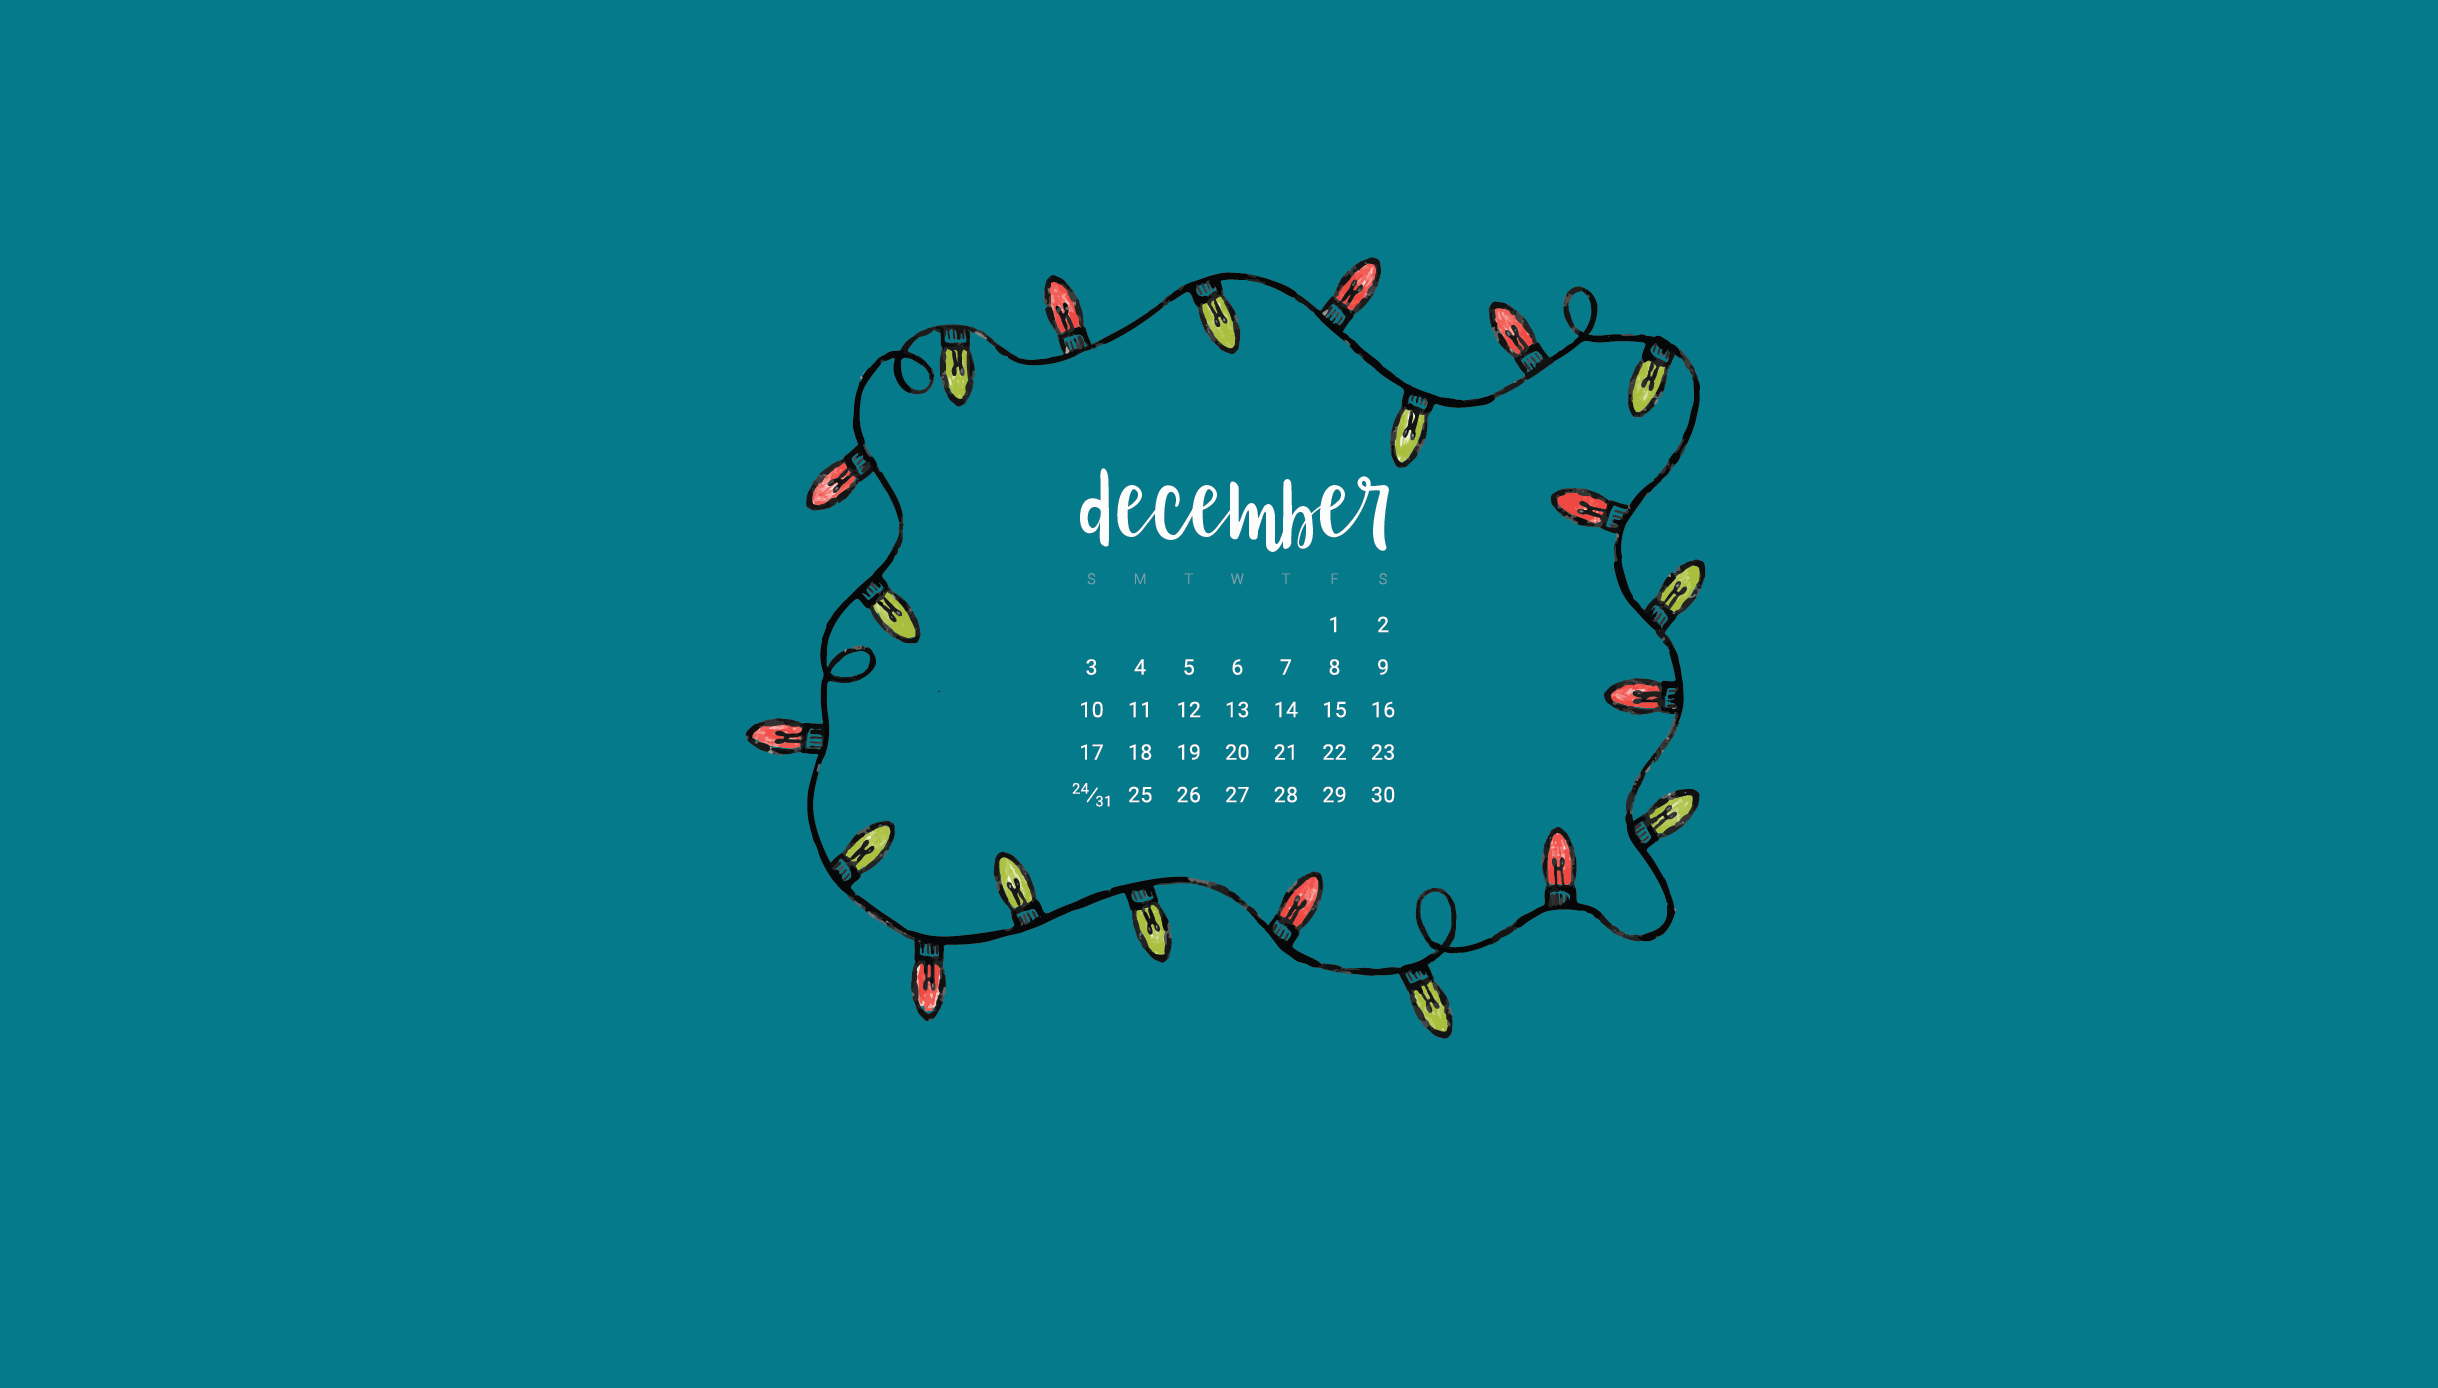 Free December 2017 Desktop And Smart Phone Wallpapers Calendar Wallpaper December Wallpaper Phone Wallpaper